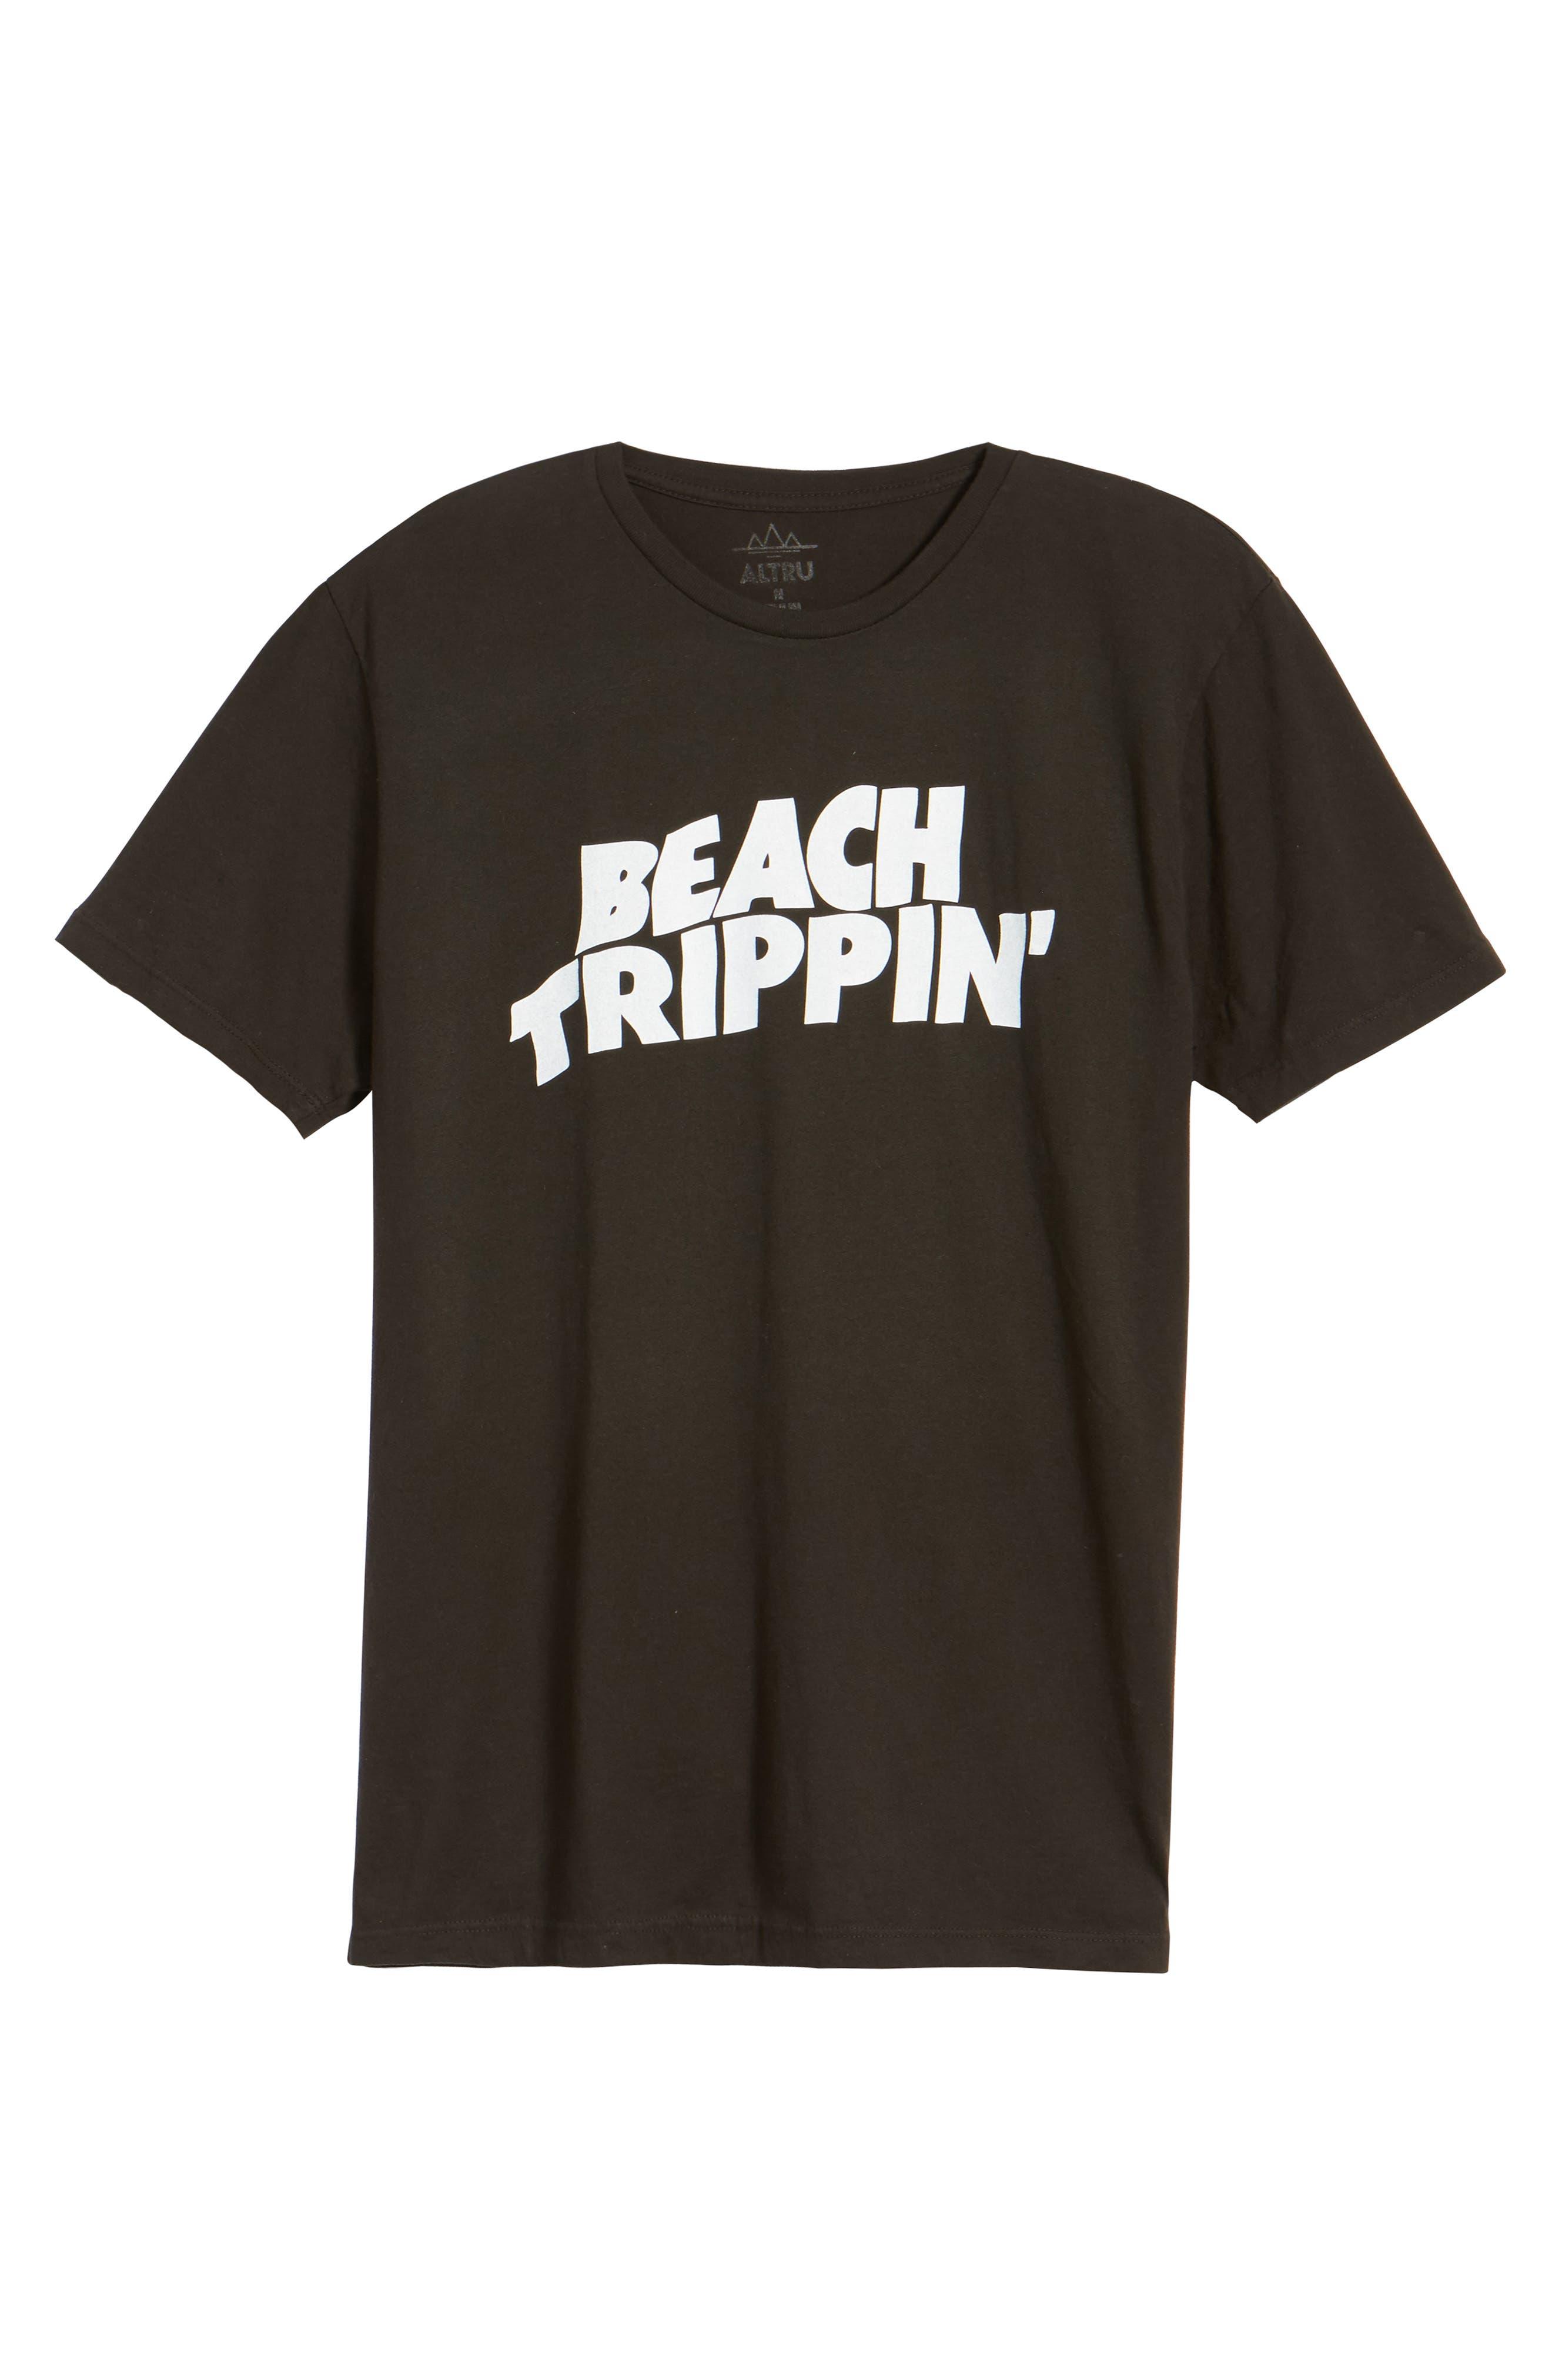 Beach Trippin' Graphic T-Shirt,                             Alternate thumbnail 6, color,                             090